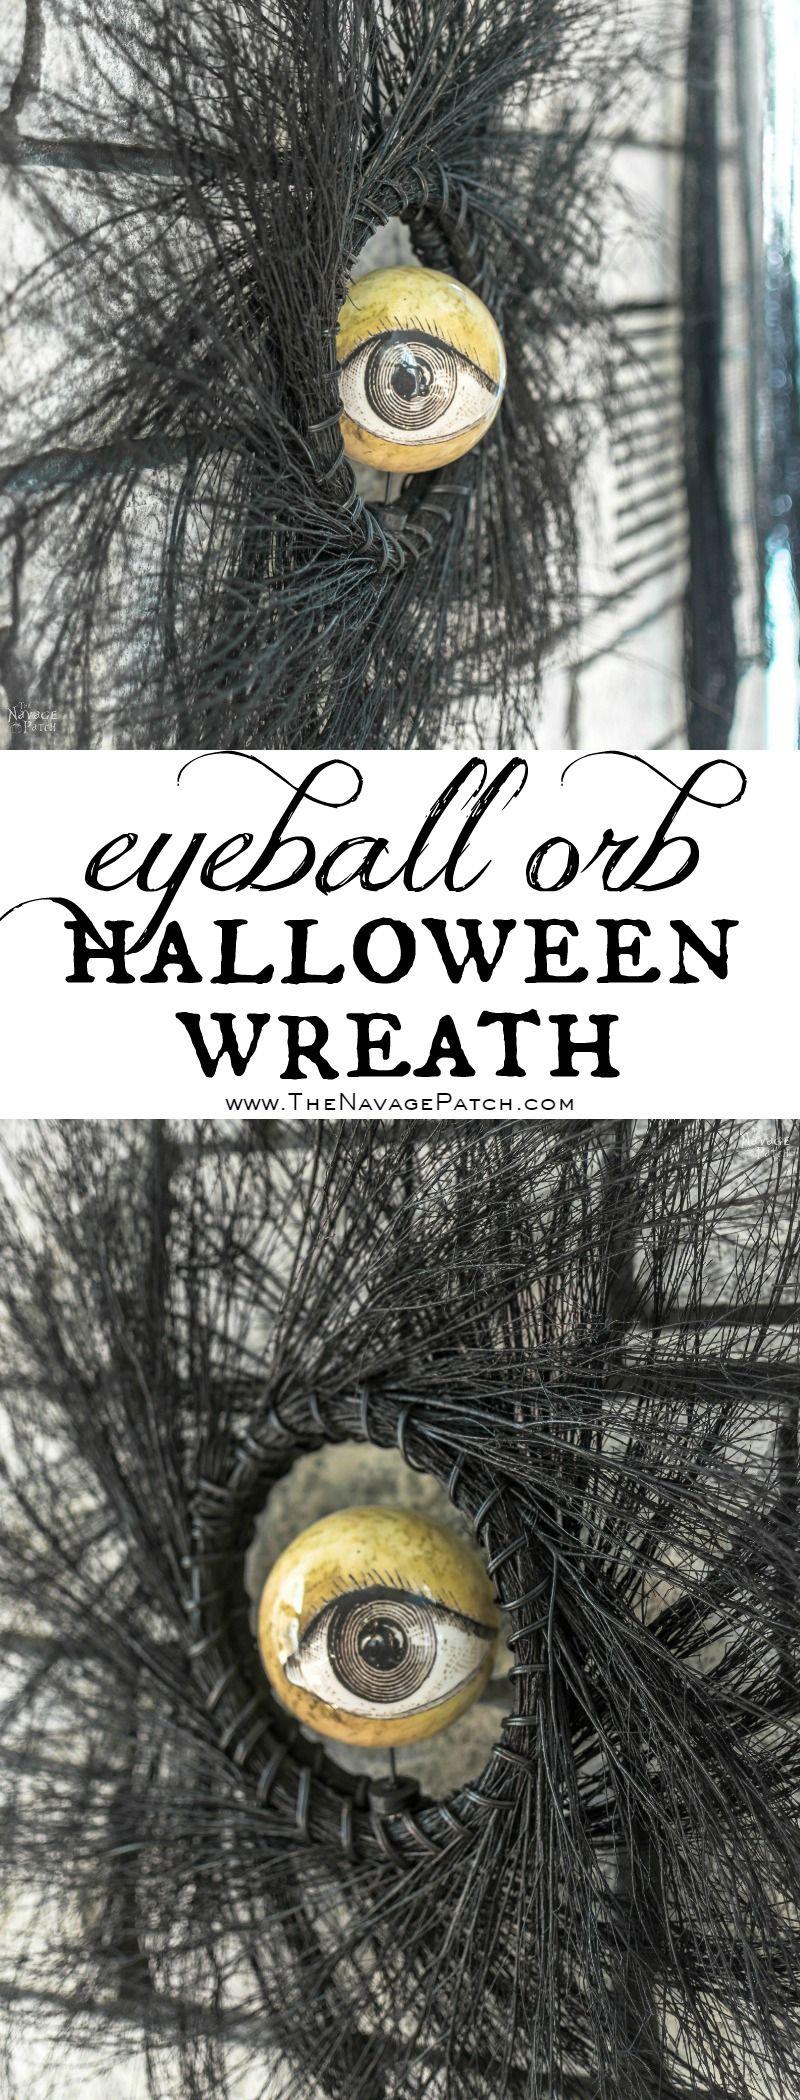 Eyeball Orb Halloween Wreath   Easy and budget friendly DIY Halloween wreath  Quick and elegant Halloween wreath   Fun and spooky Halloween decorations  TheNavagePatch.com